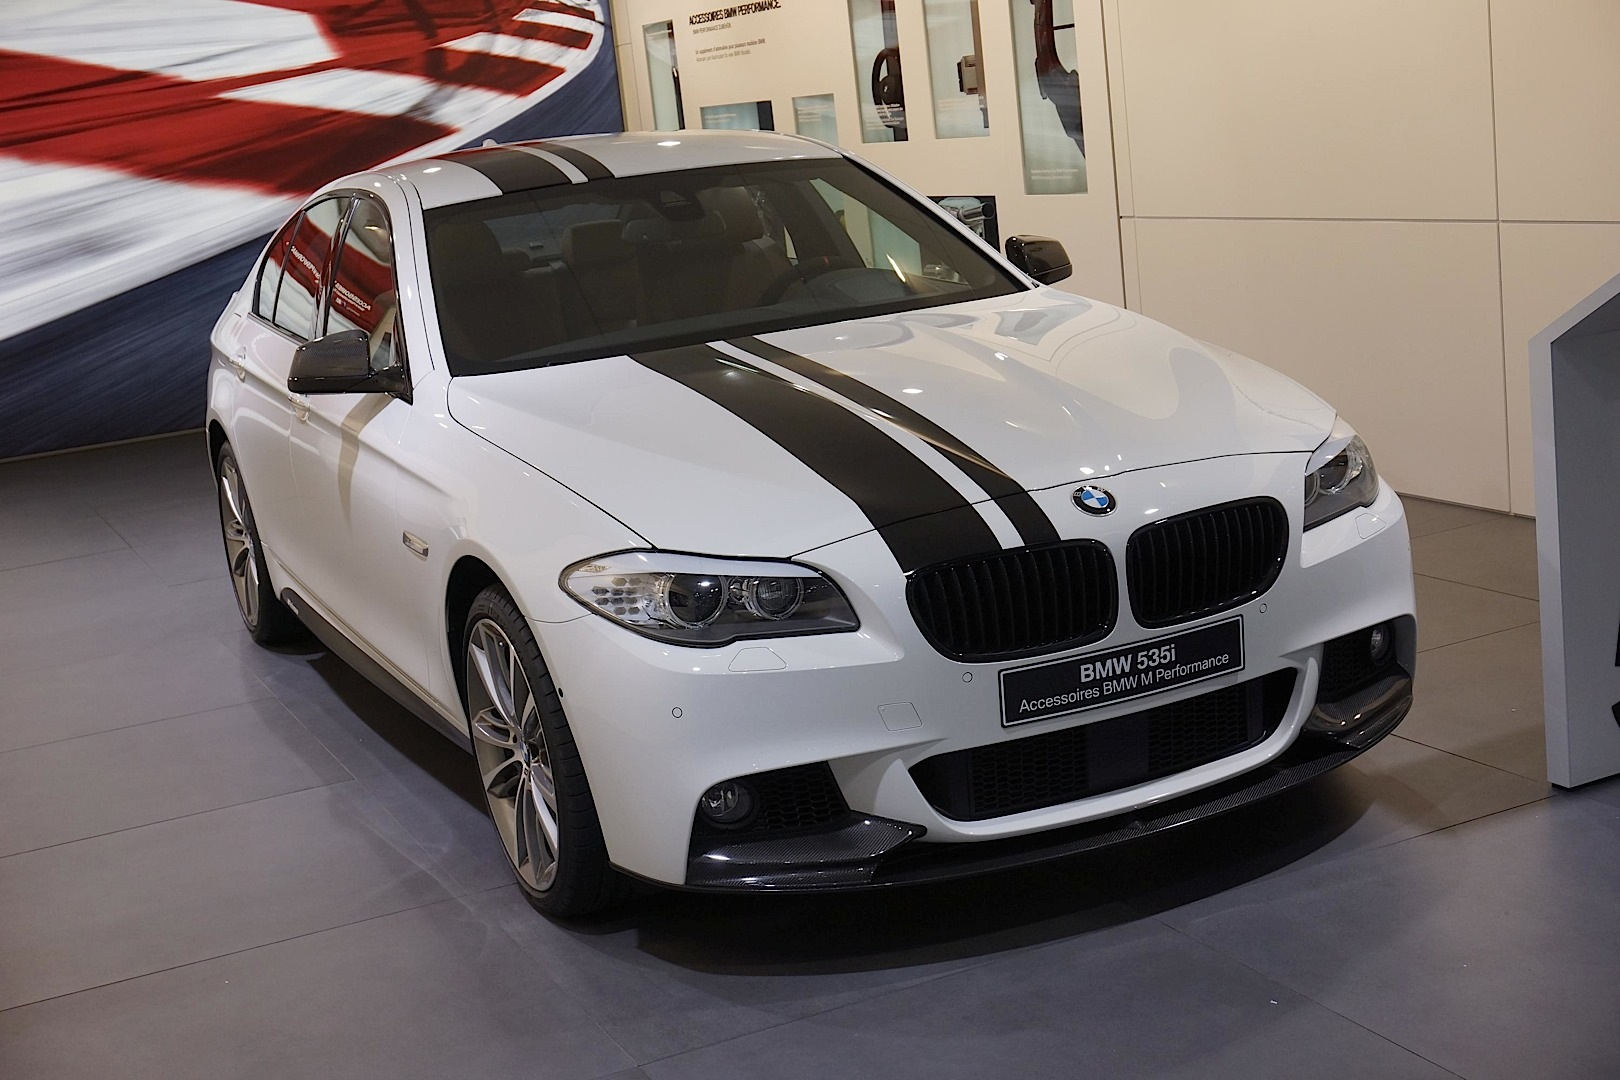 Striped Bmw F10 535i M Sport Shows Up In Geneva